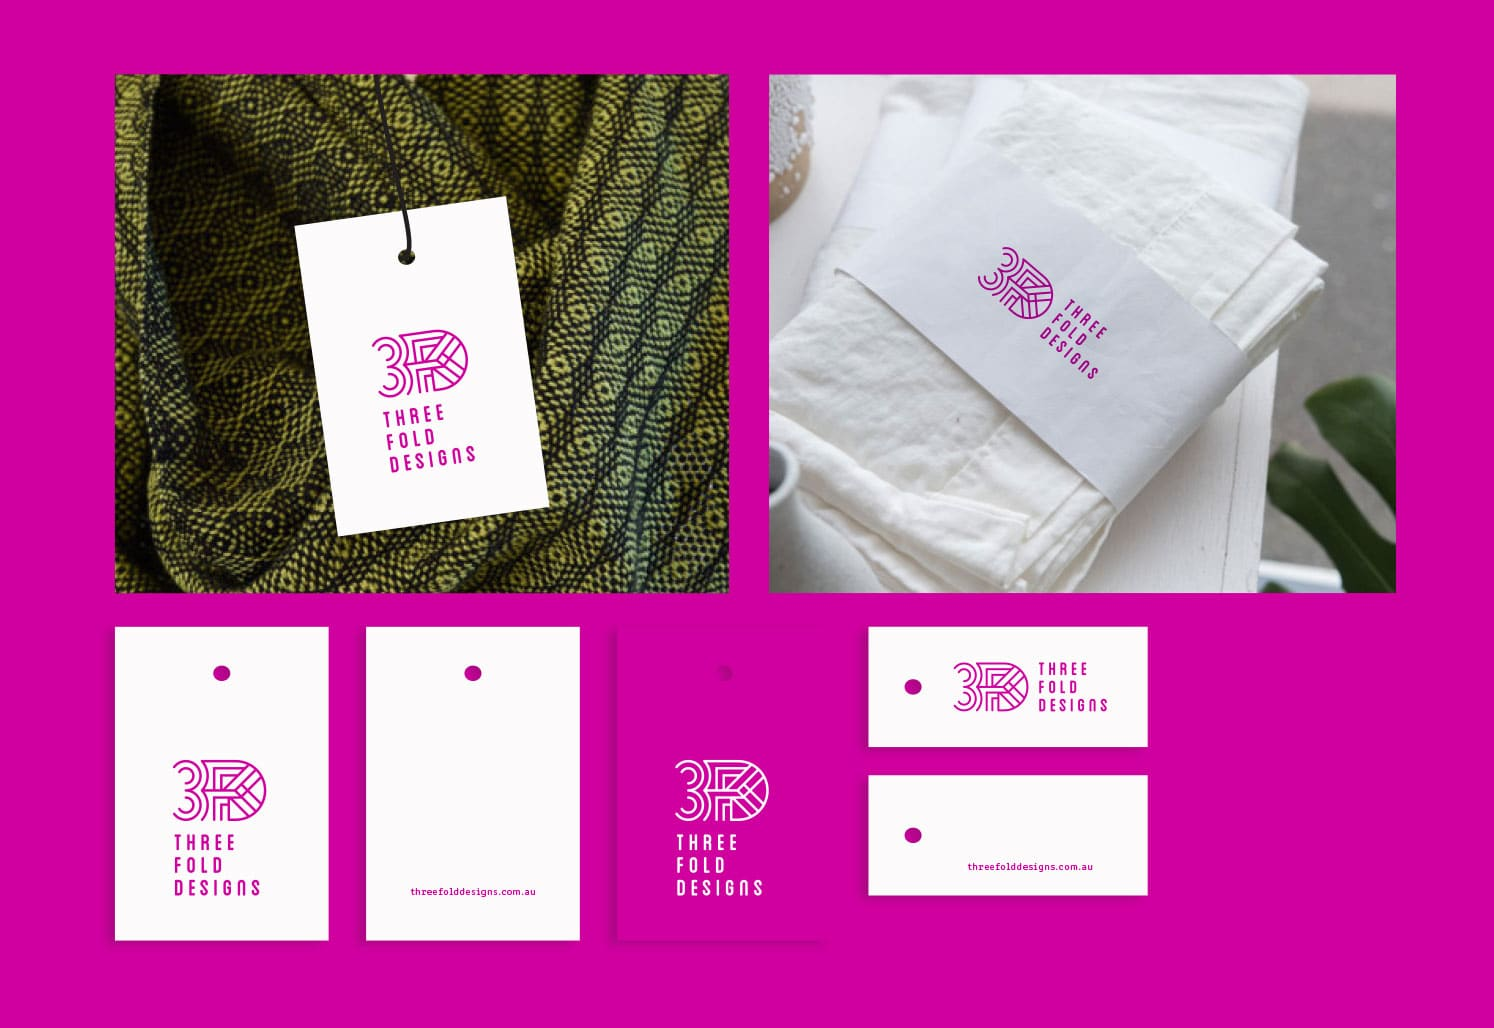 Threeefold Design swing tag design